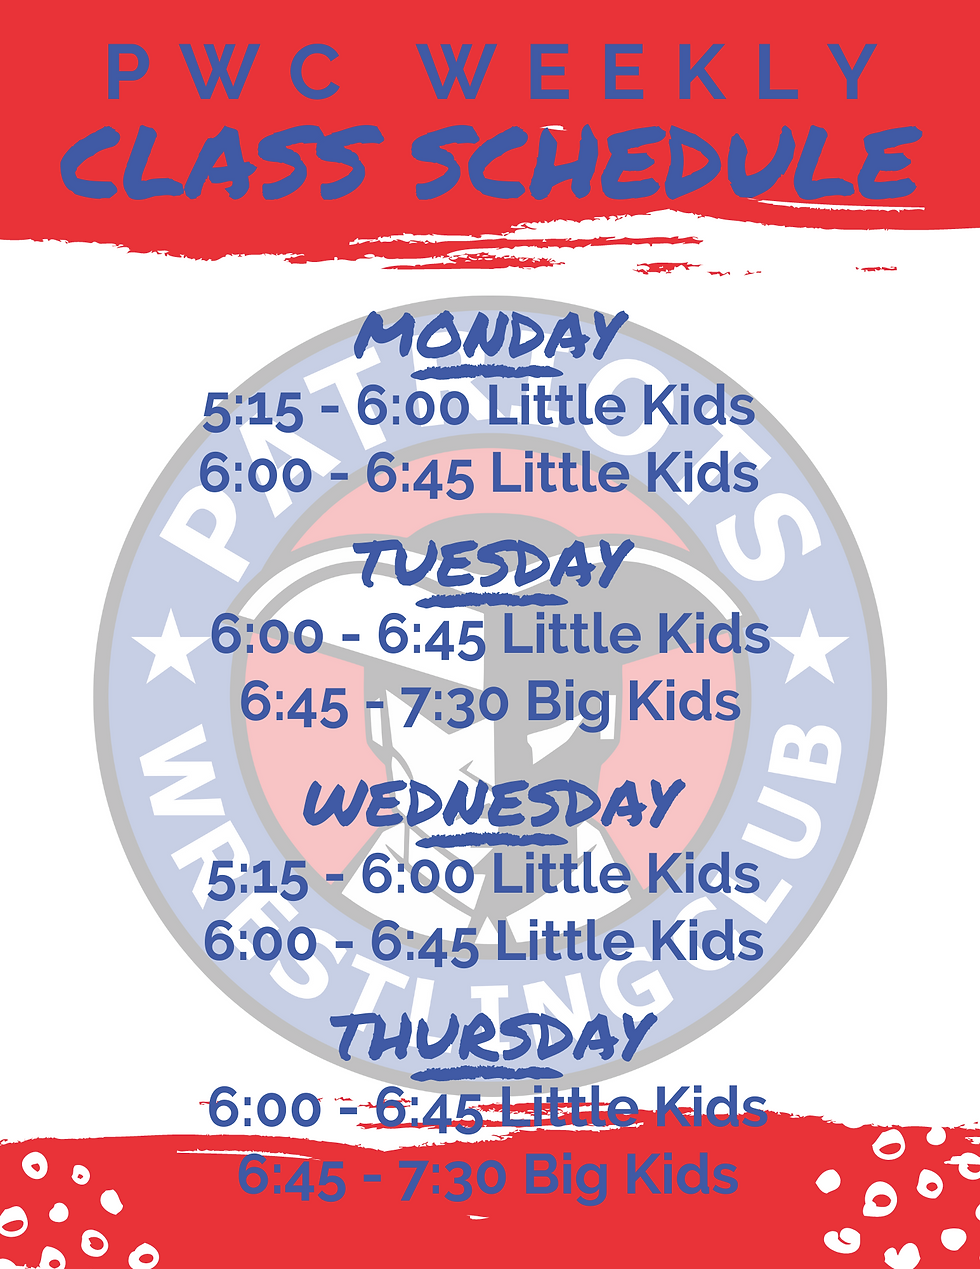 Weekly Schedule.png